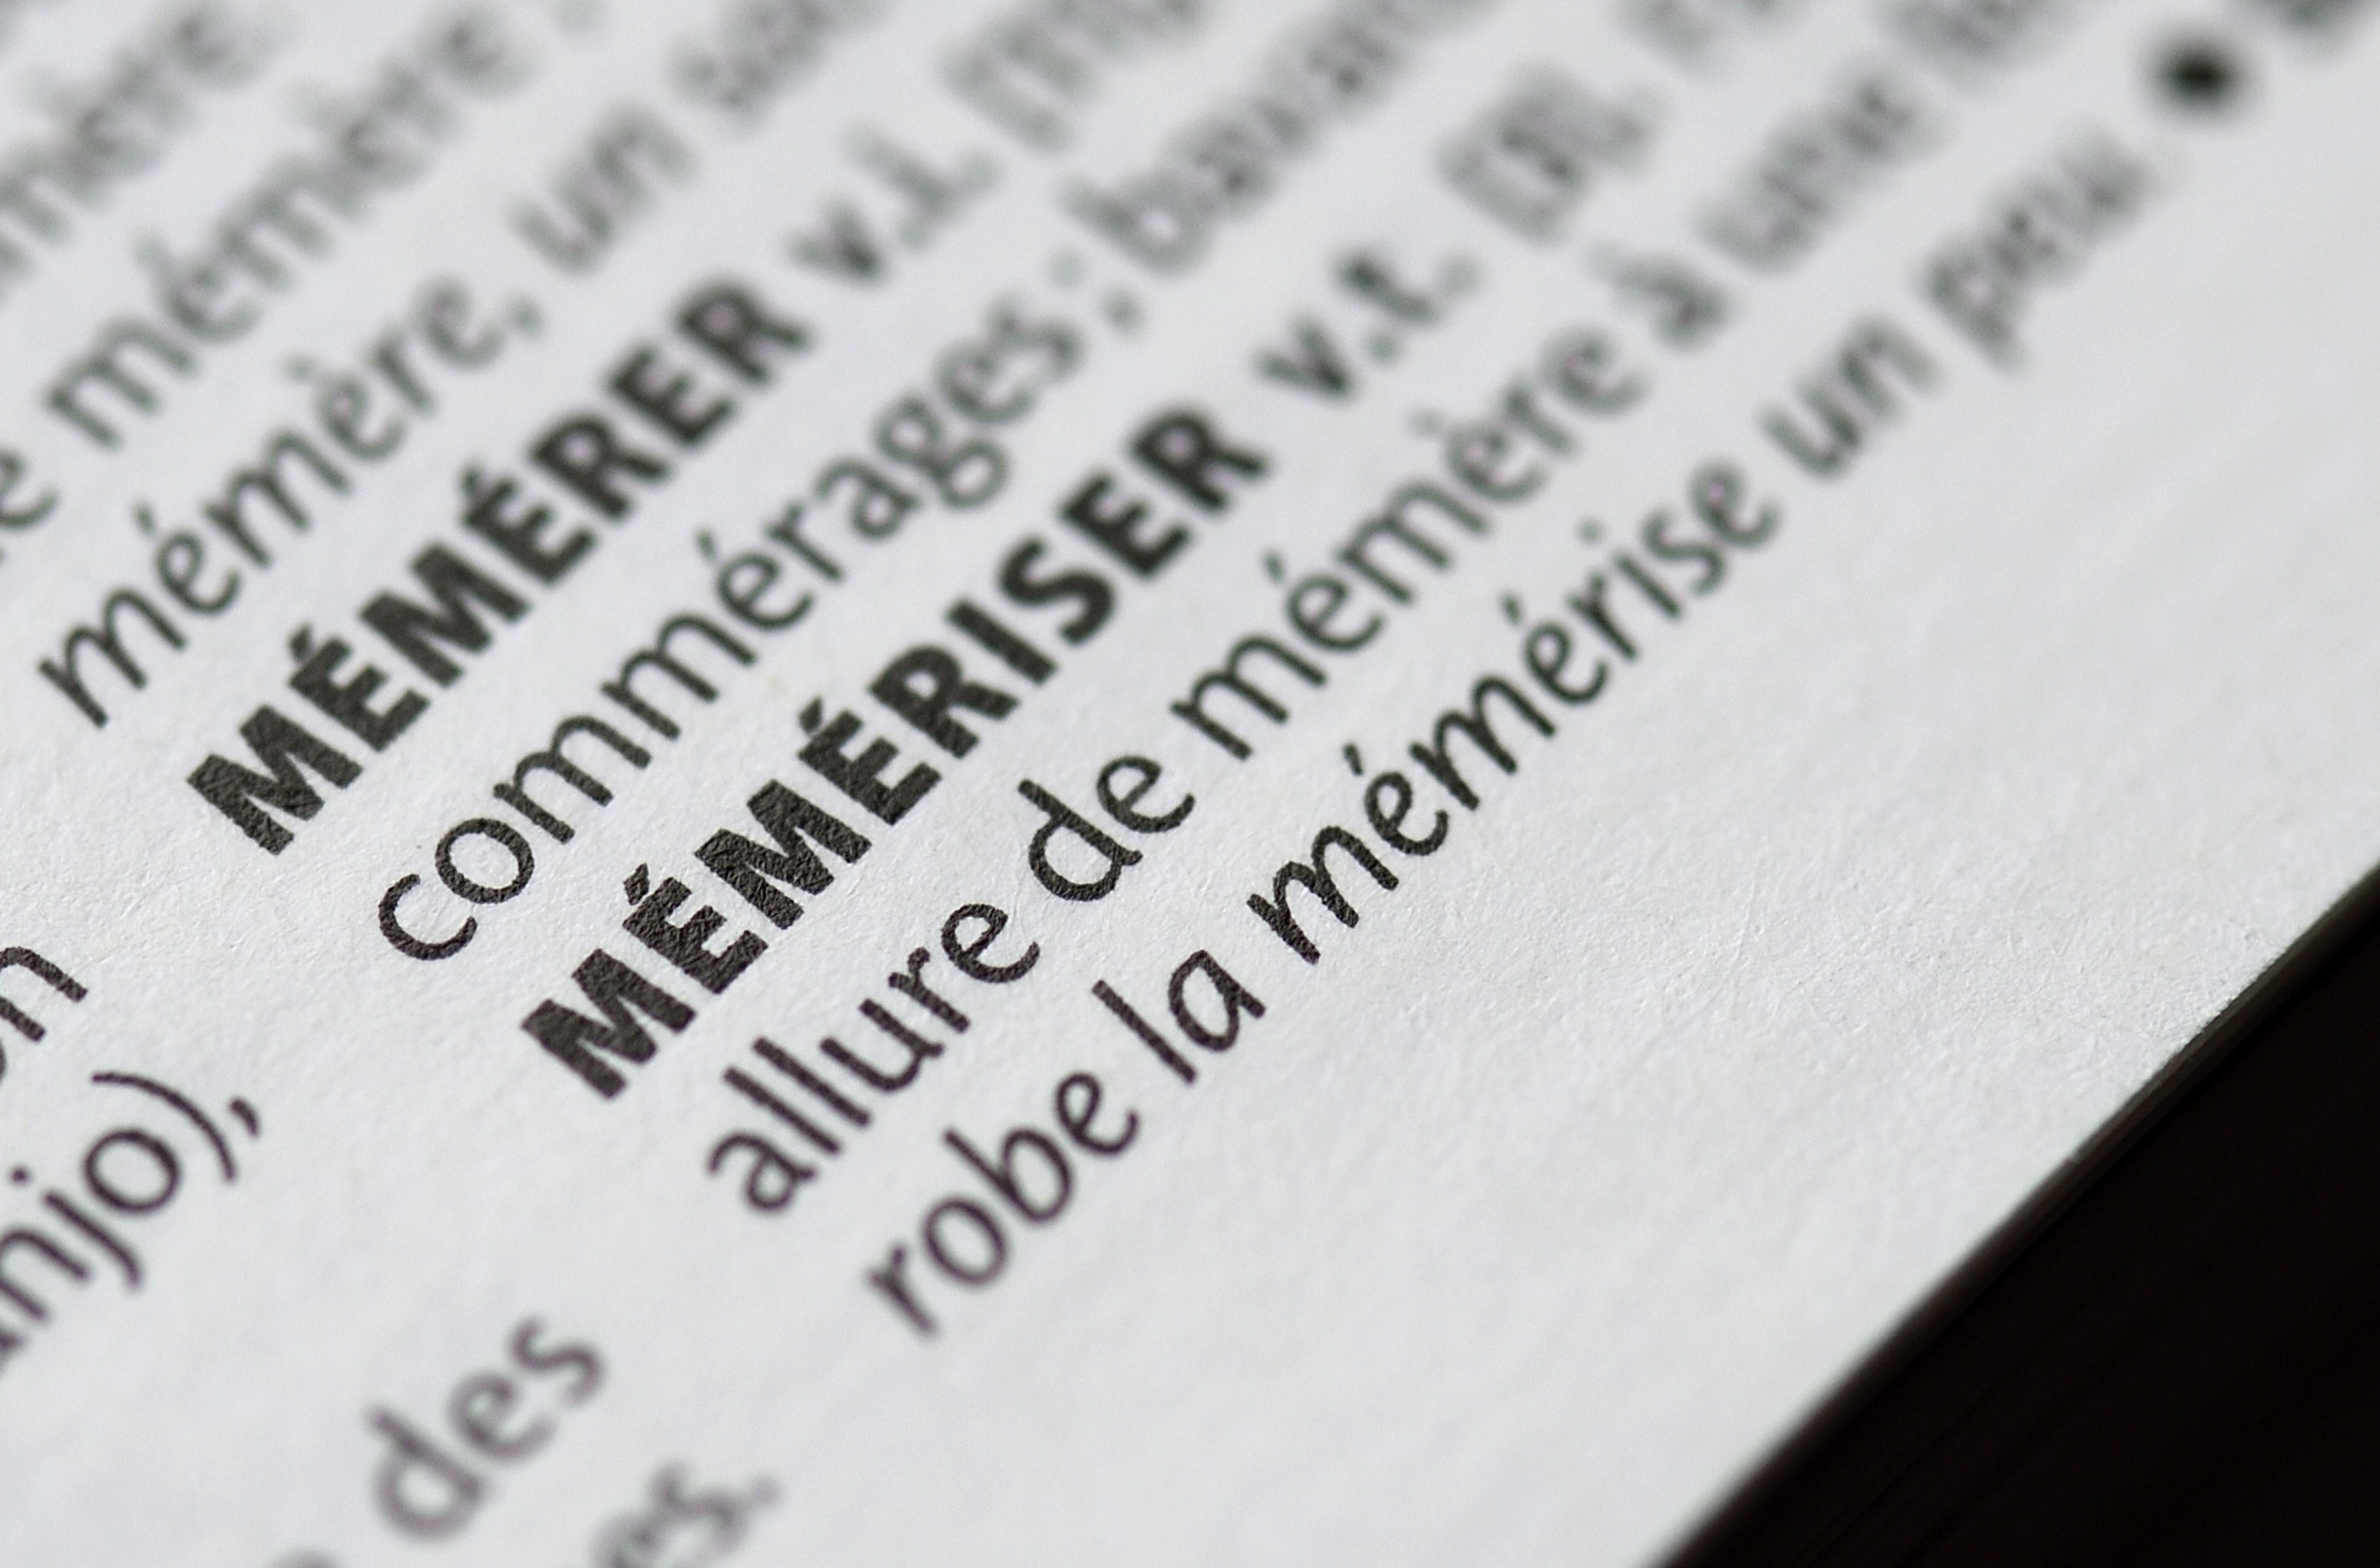 FRANCE-DICTIONARIES-LAROUSSE 2016